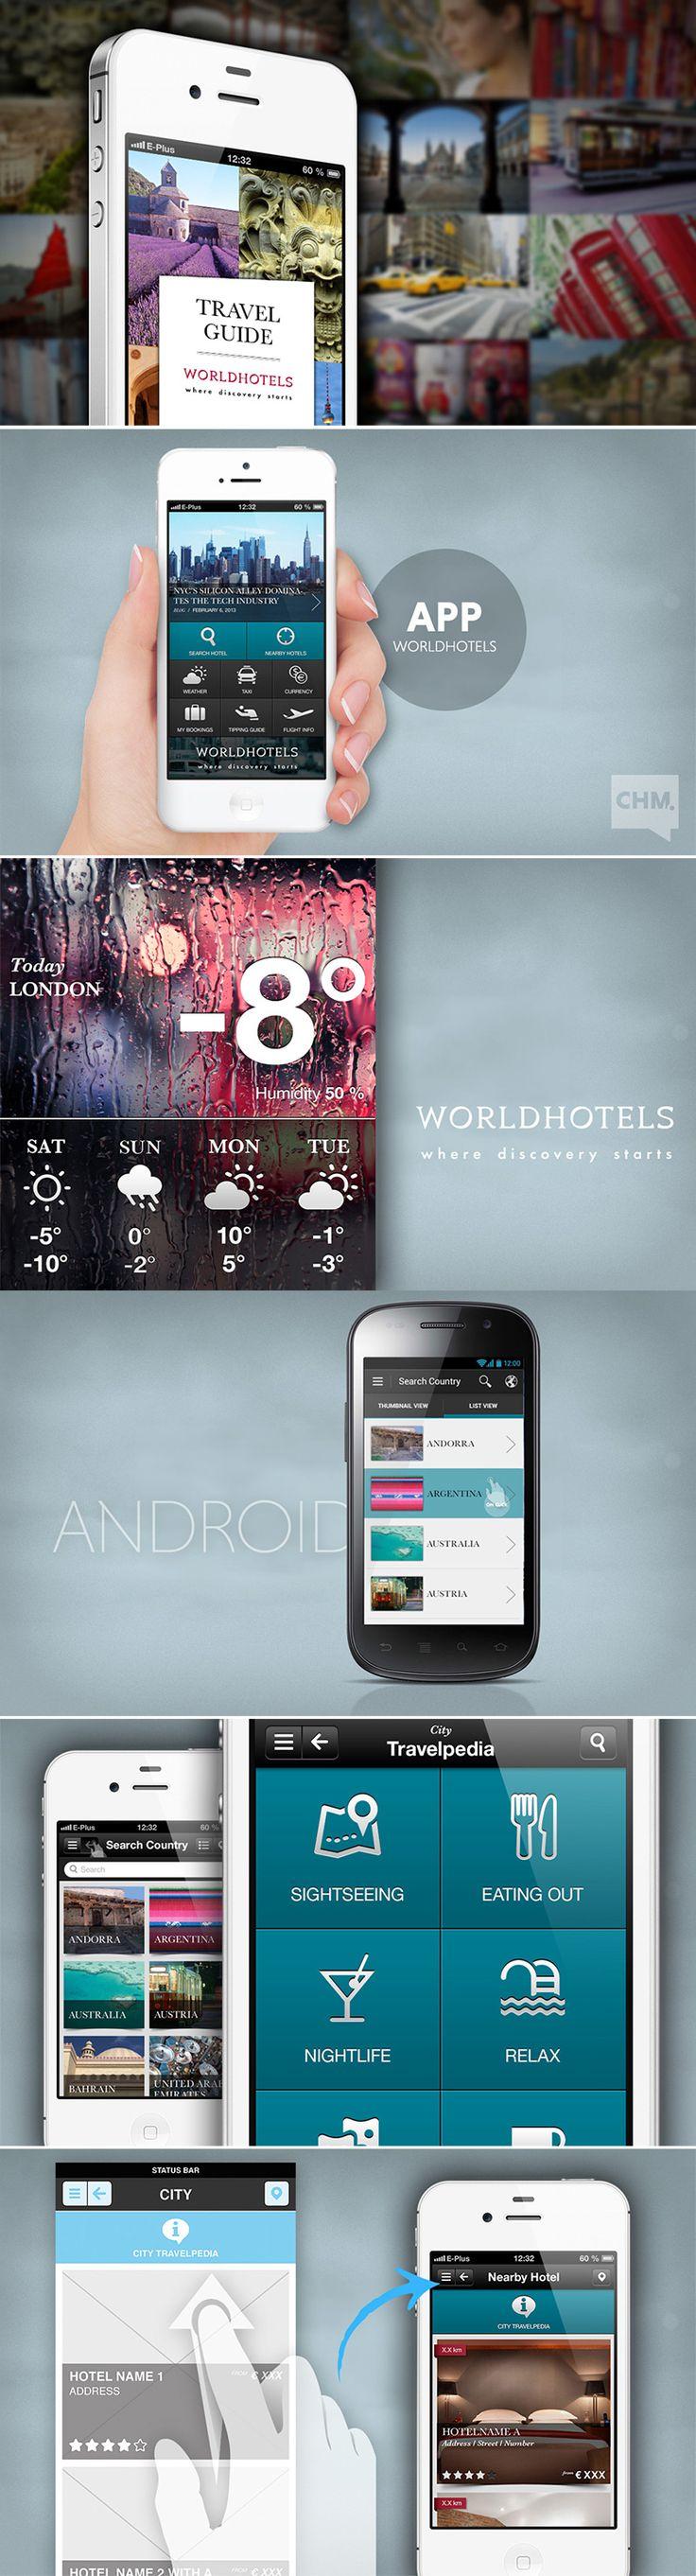 Der Travelguide für unterwegs  |  APP WORLDHOTELS  | https://itunes.apple.com/de/app/travel-guide-by-worldhotels/id673089717?mt=8  #app #screendesign